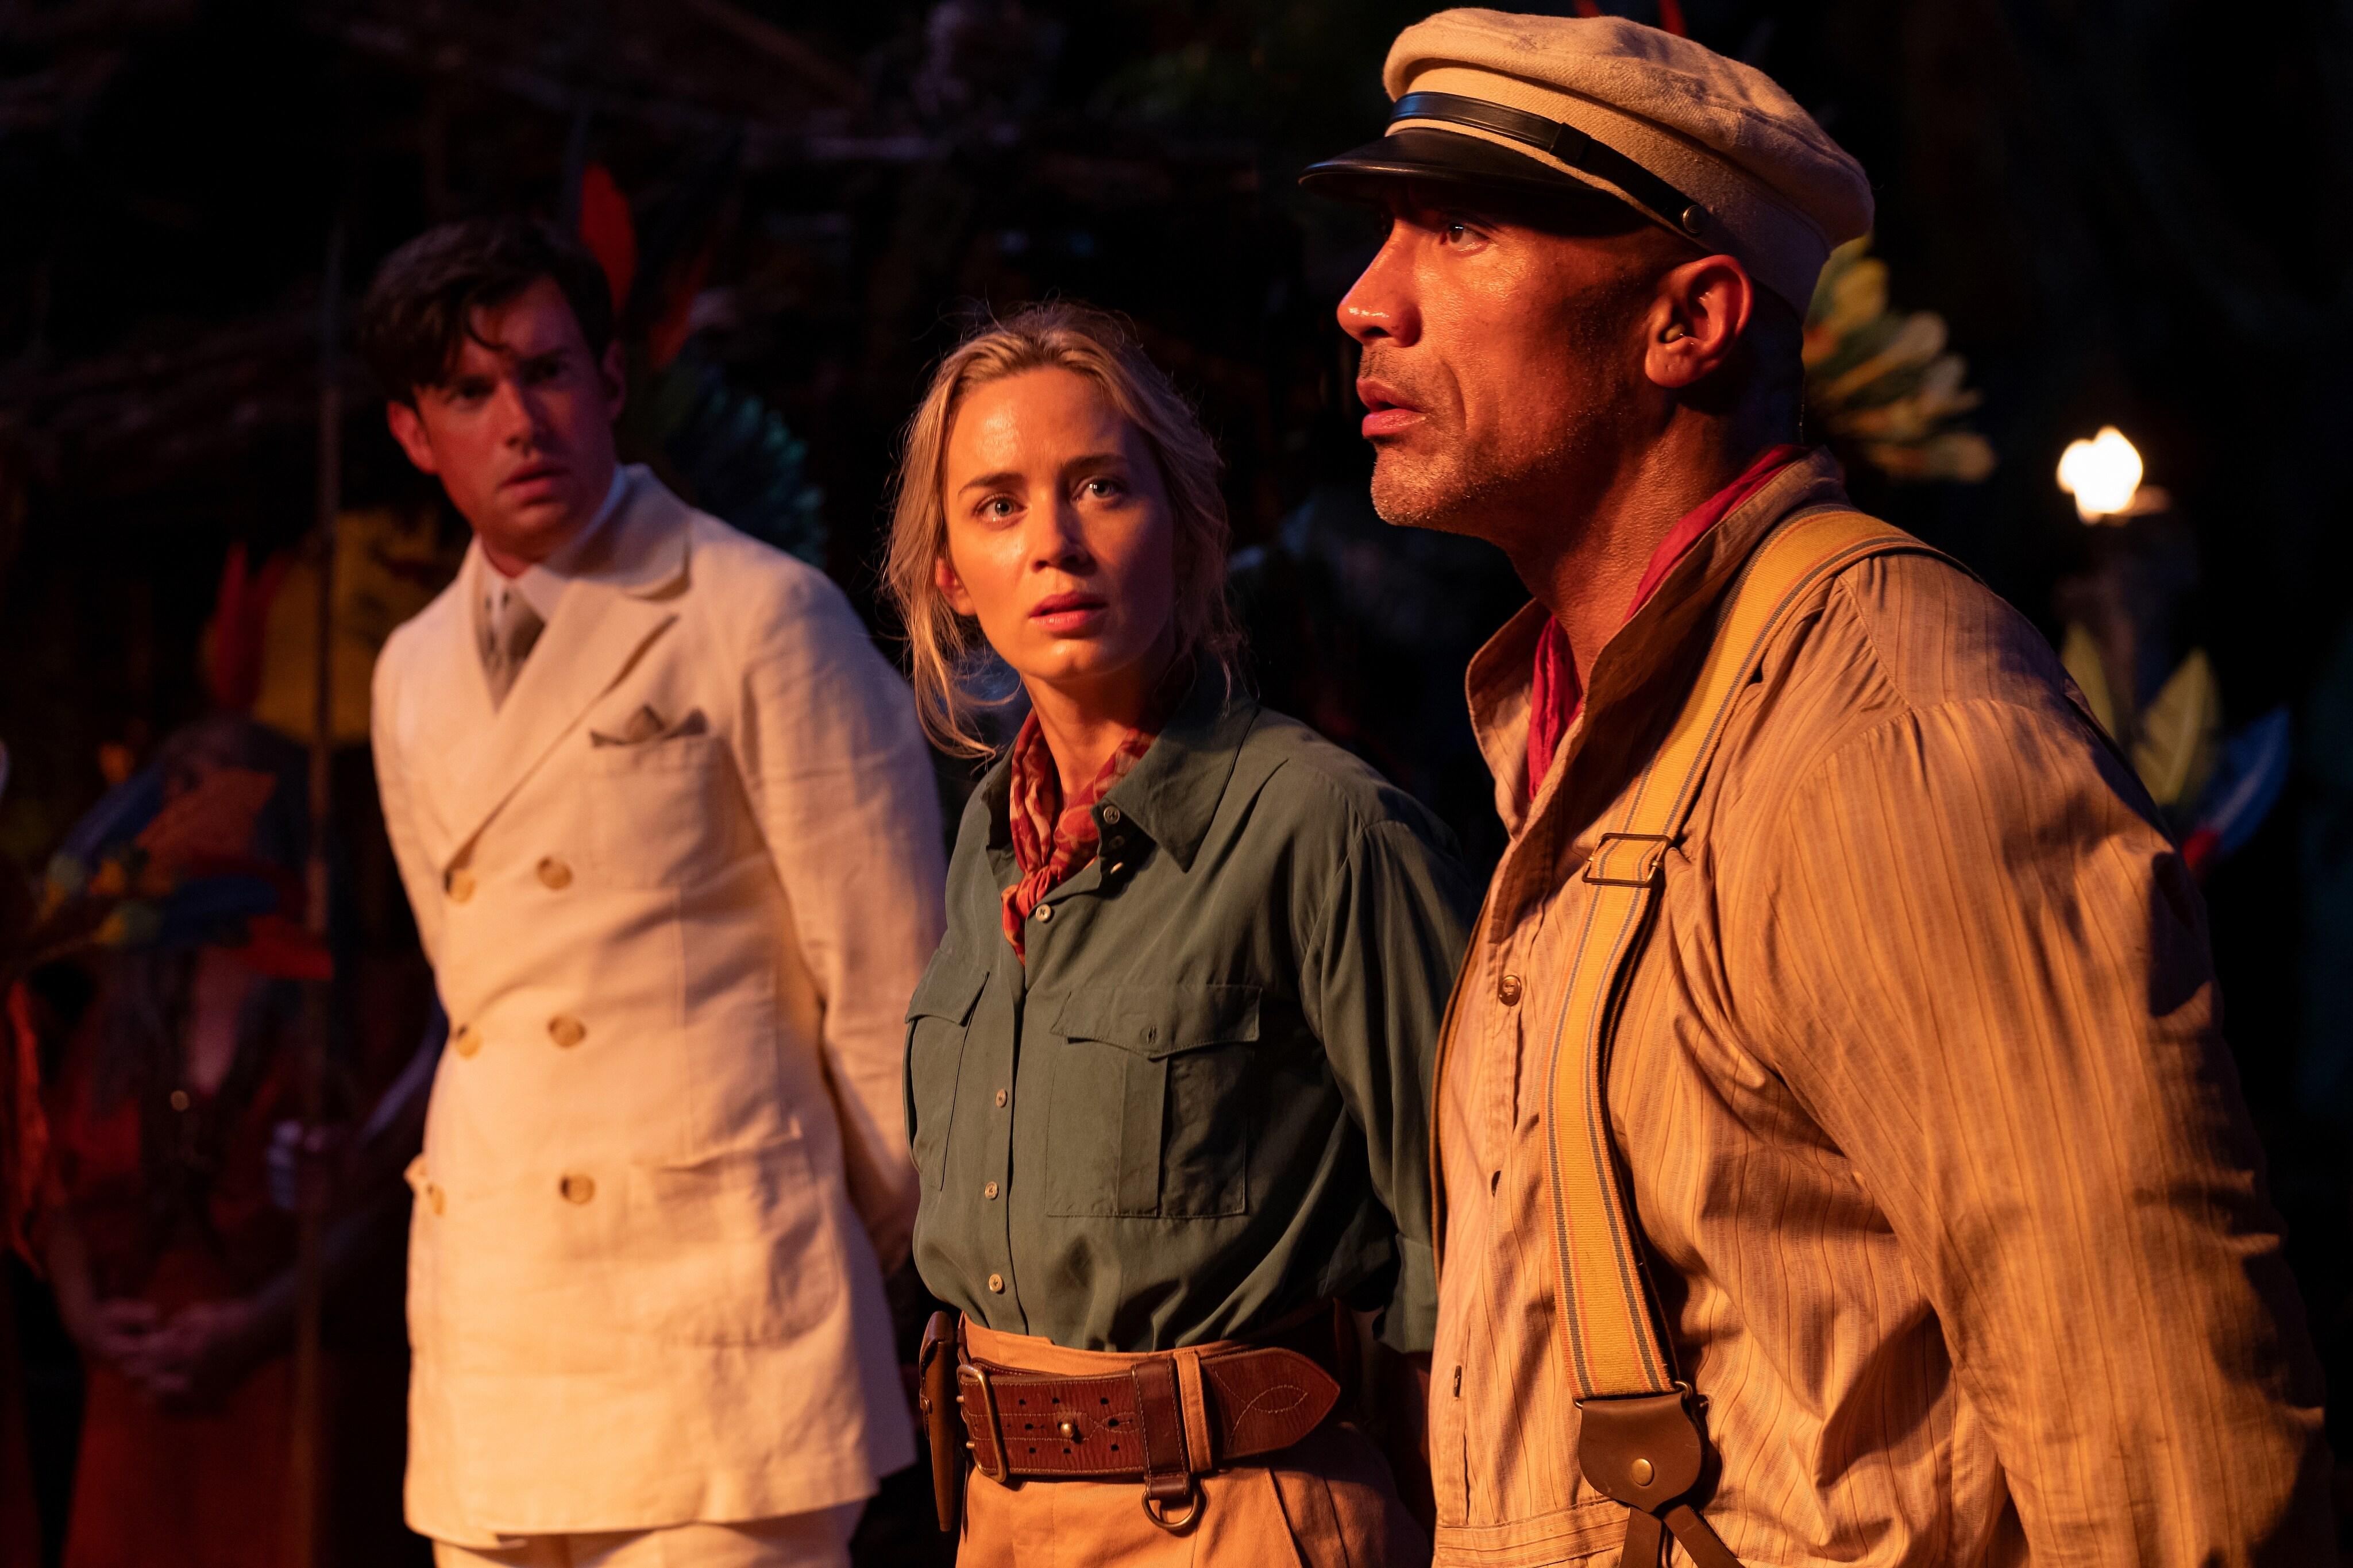 Disney's Jungle Cruise Film Still of Jack Whitehall, Emily Blunt, and Dwayne Johnson filming a scene